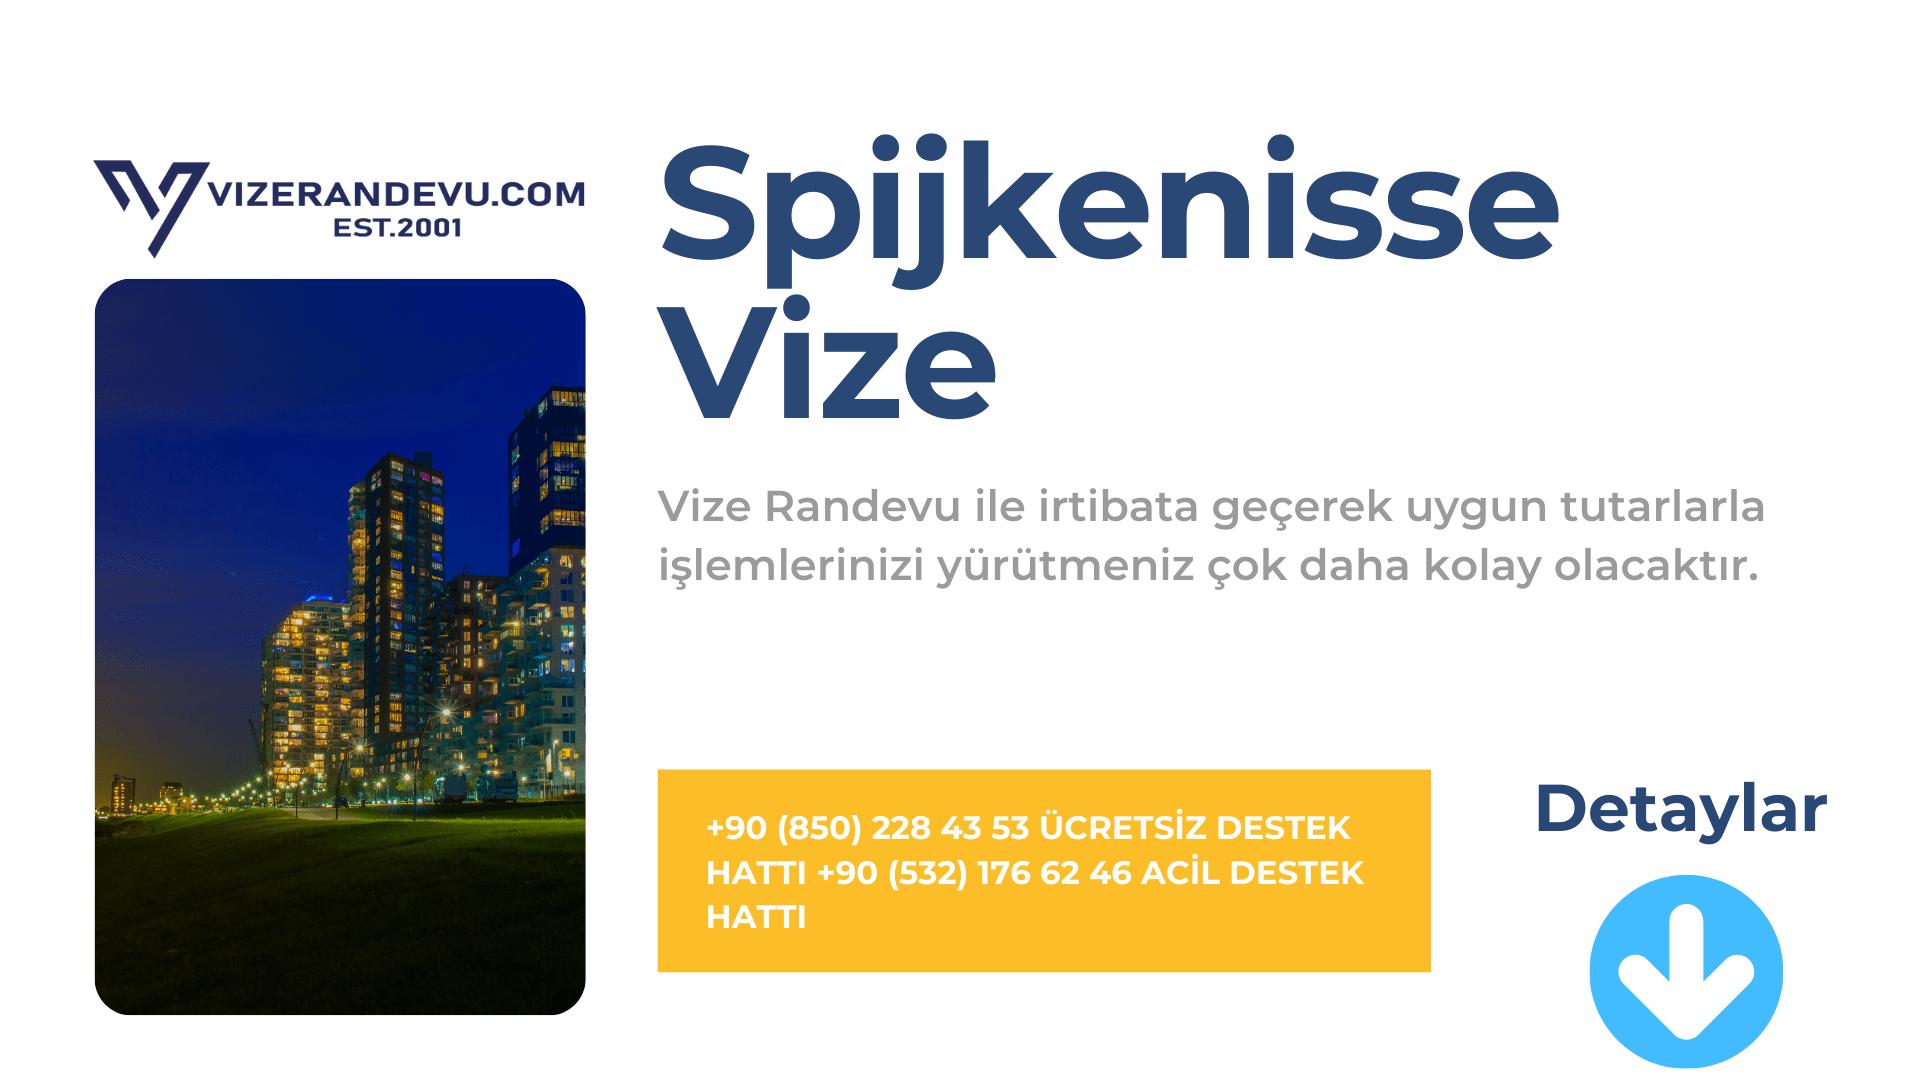 Hollanda Spijkenisse Vize Başvurusu